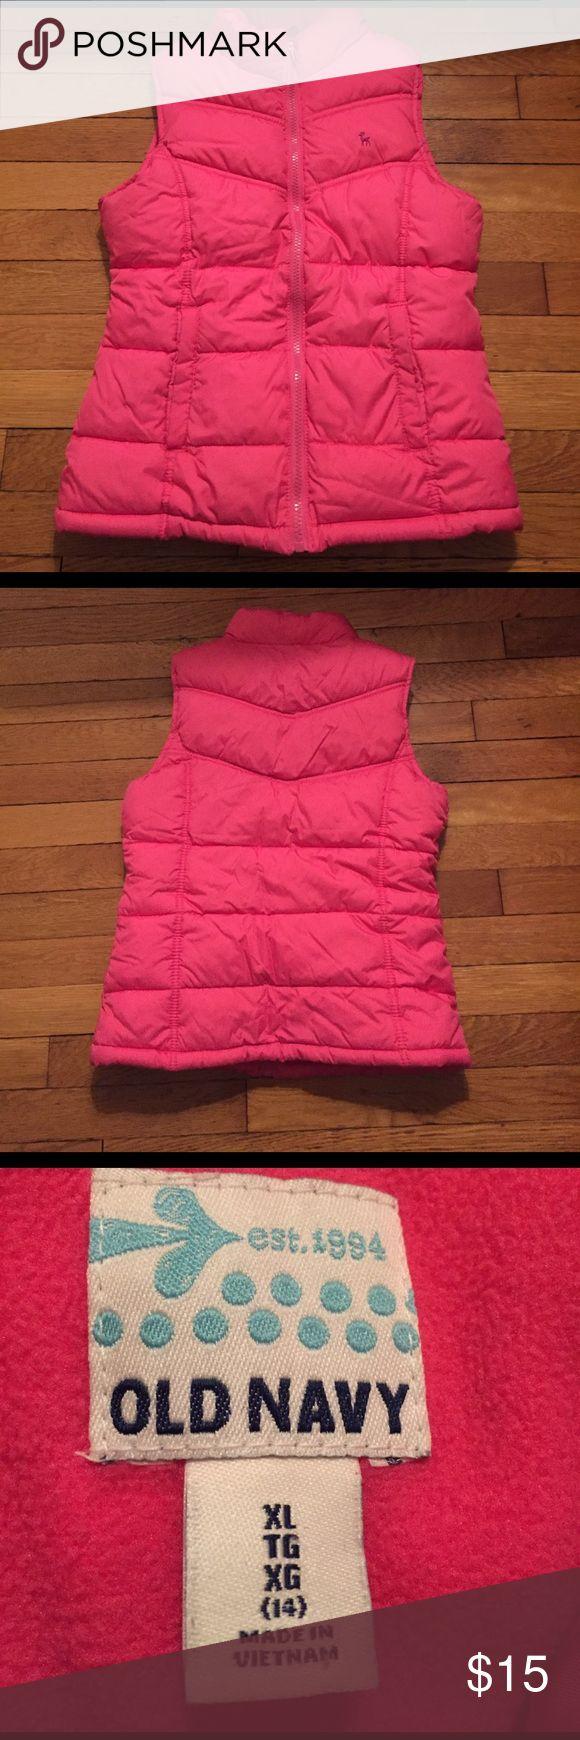 Like new Old Navy vest Like new pink old navy vest size 14 Old Navy Jackets & Coats Vests